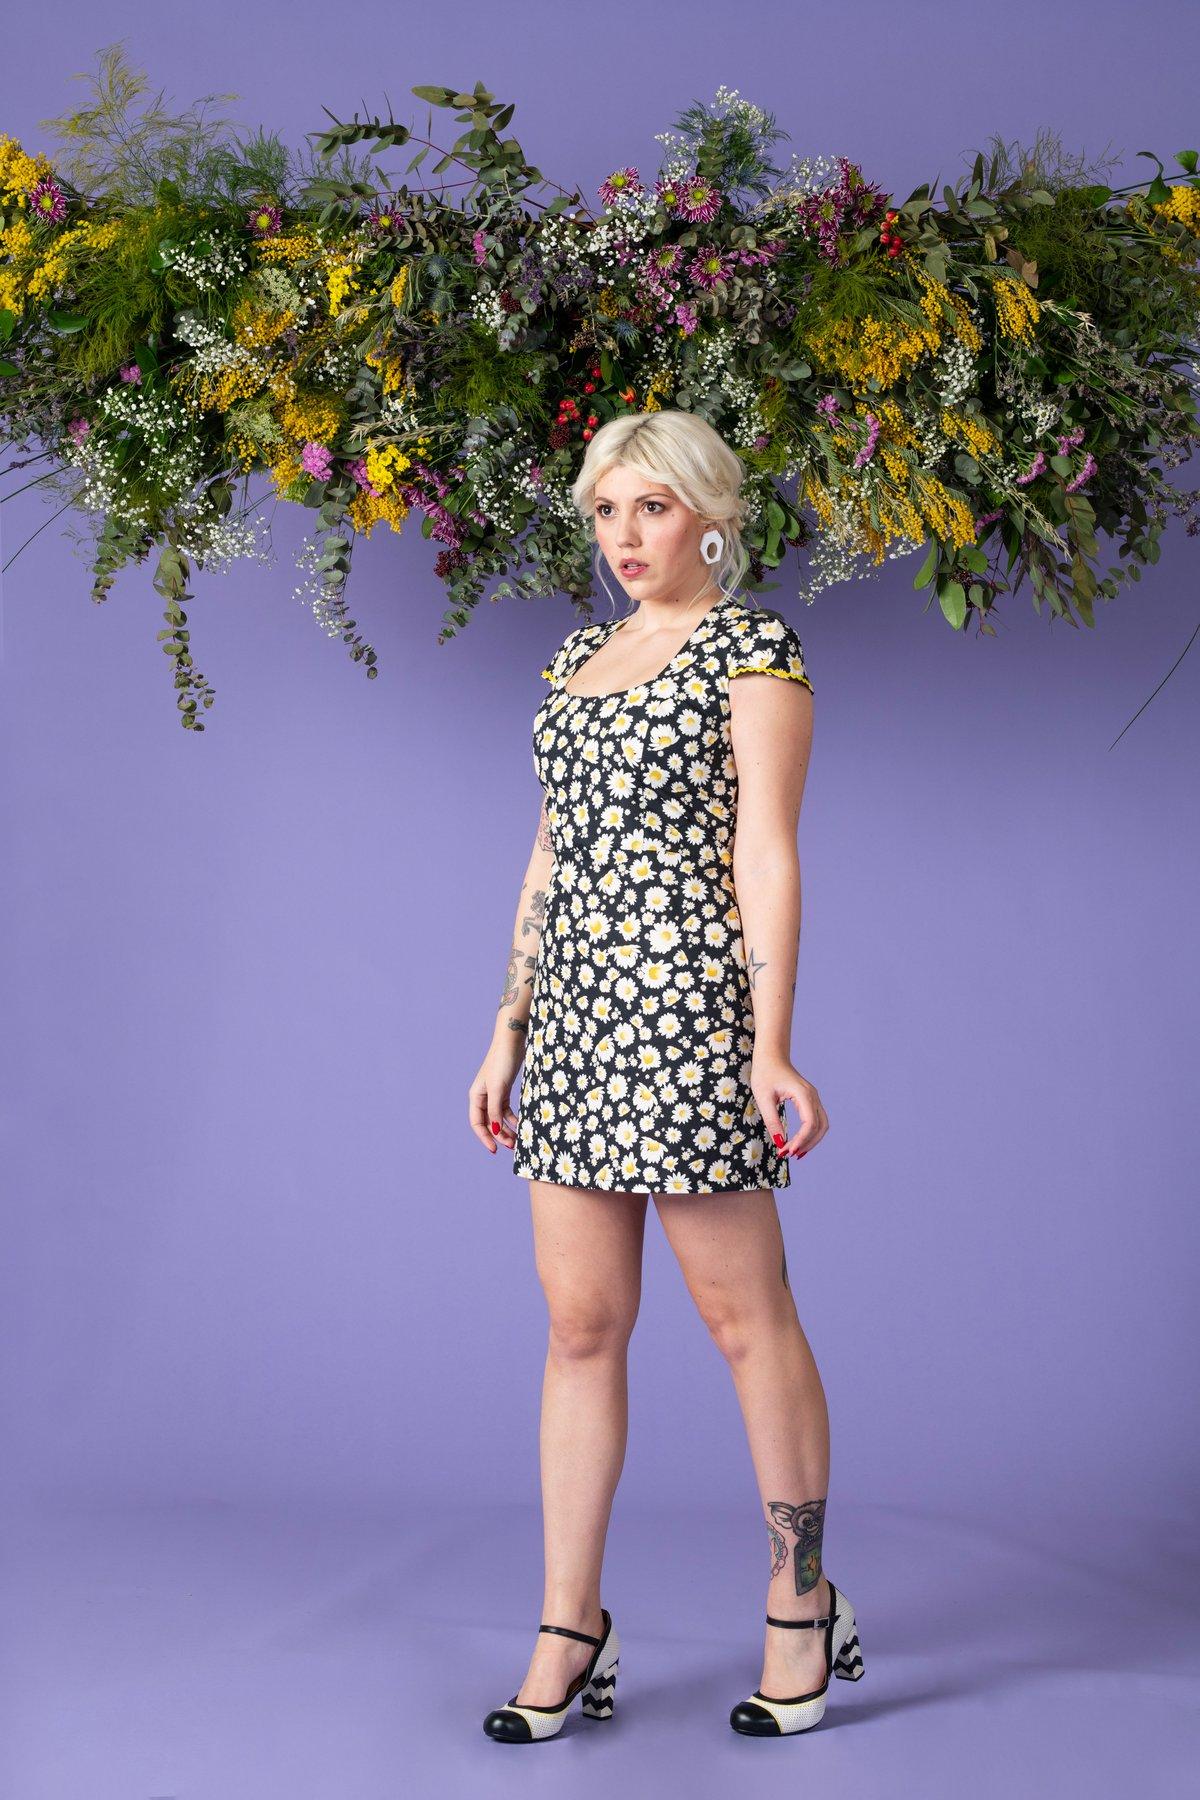 Image of Vestido Betty Friedan